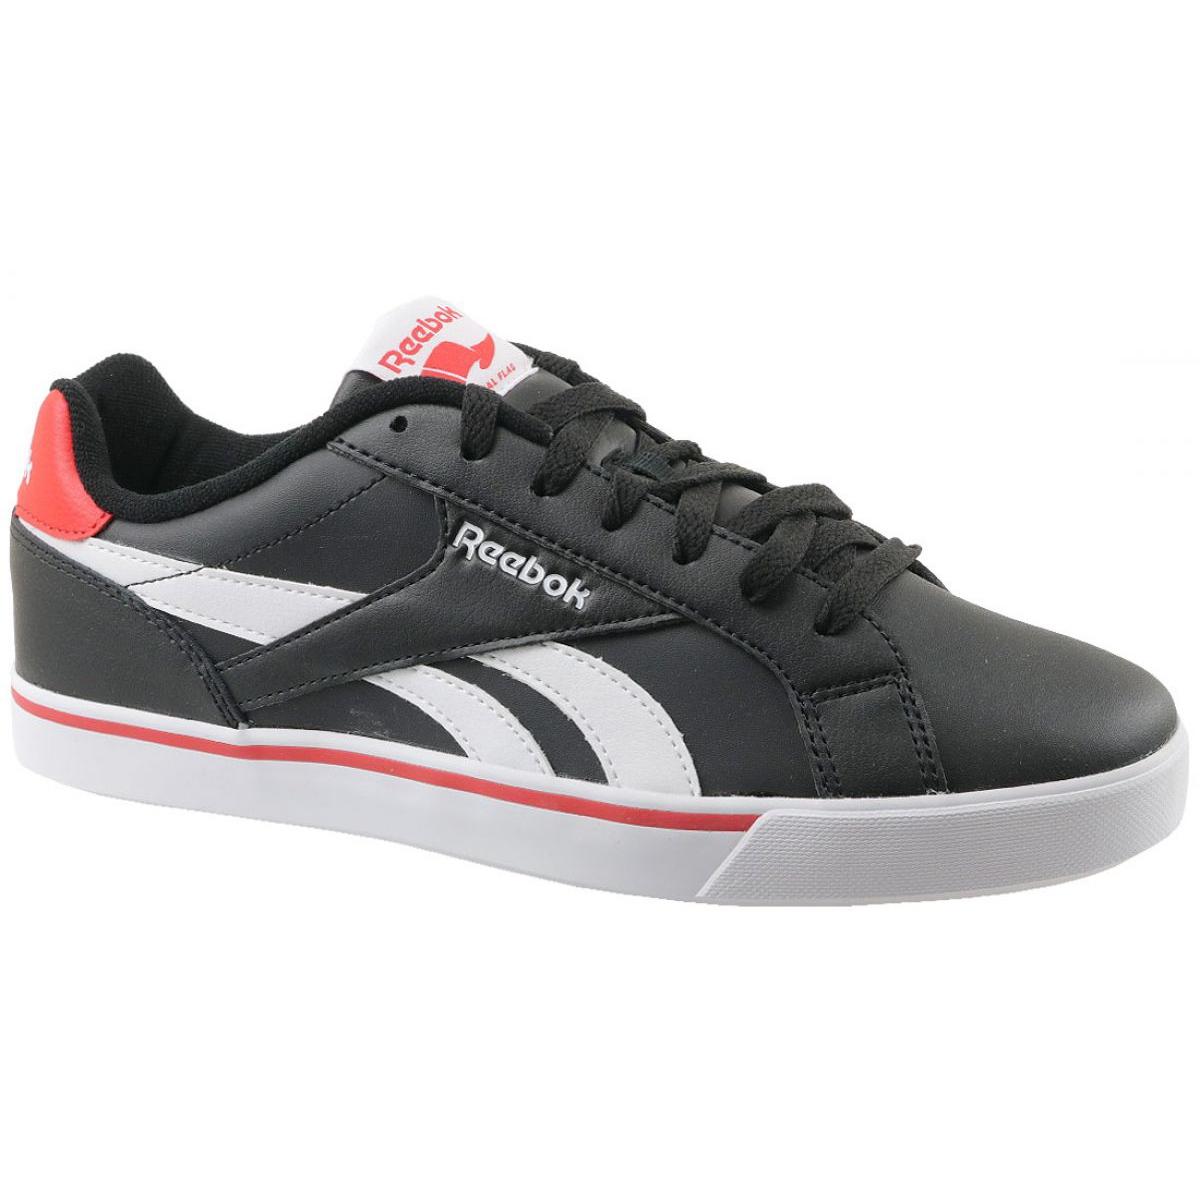 Reebok Royal Complete 2LL M AR2427 Schuhe schwarz